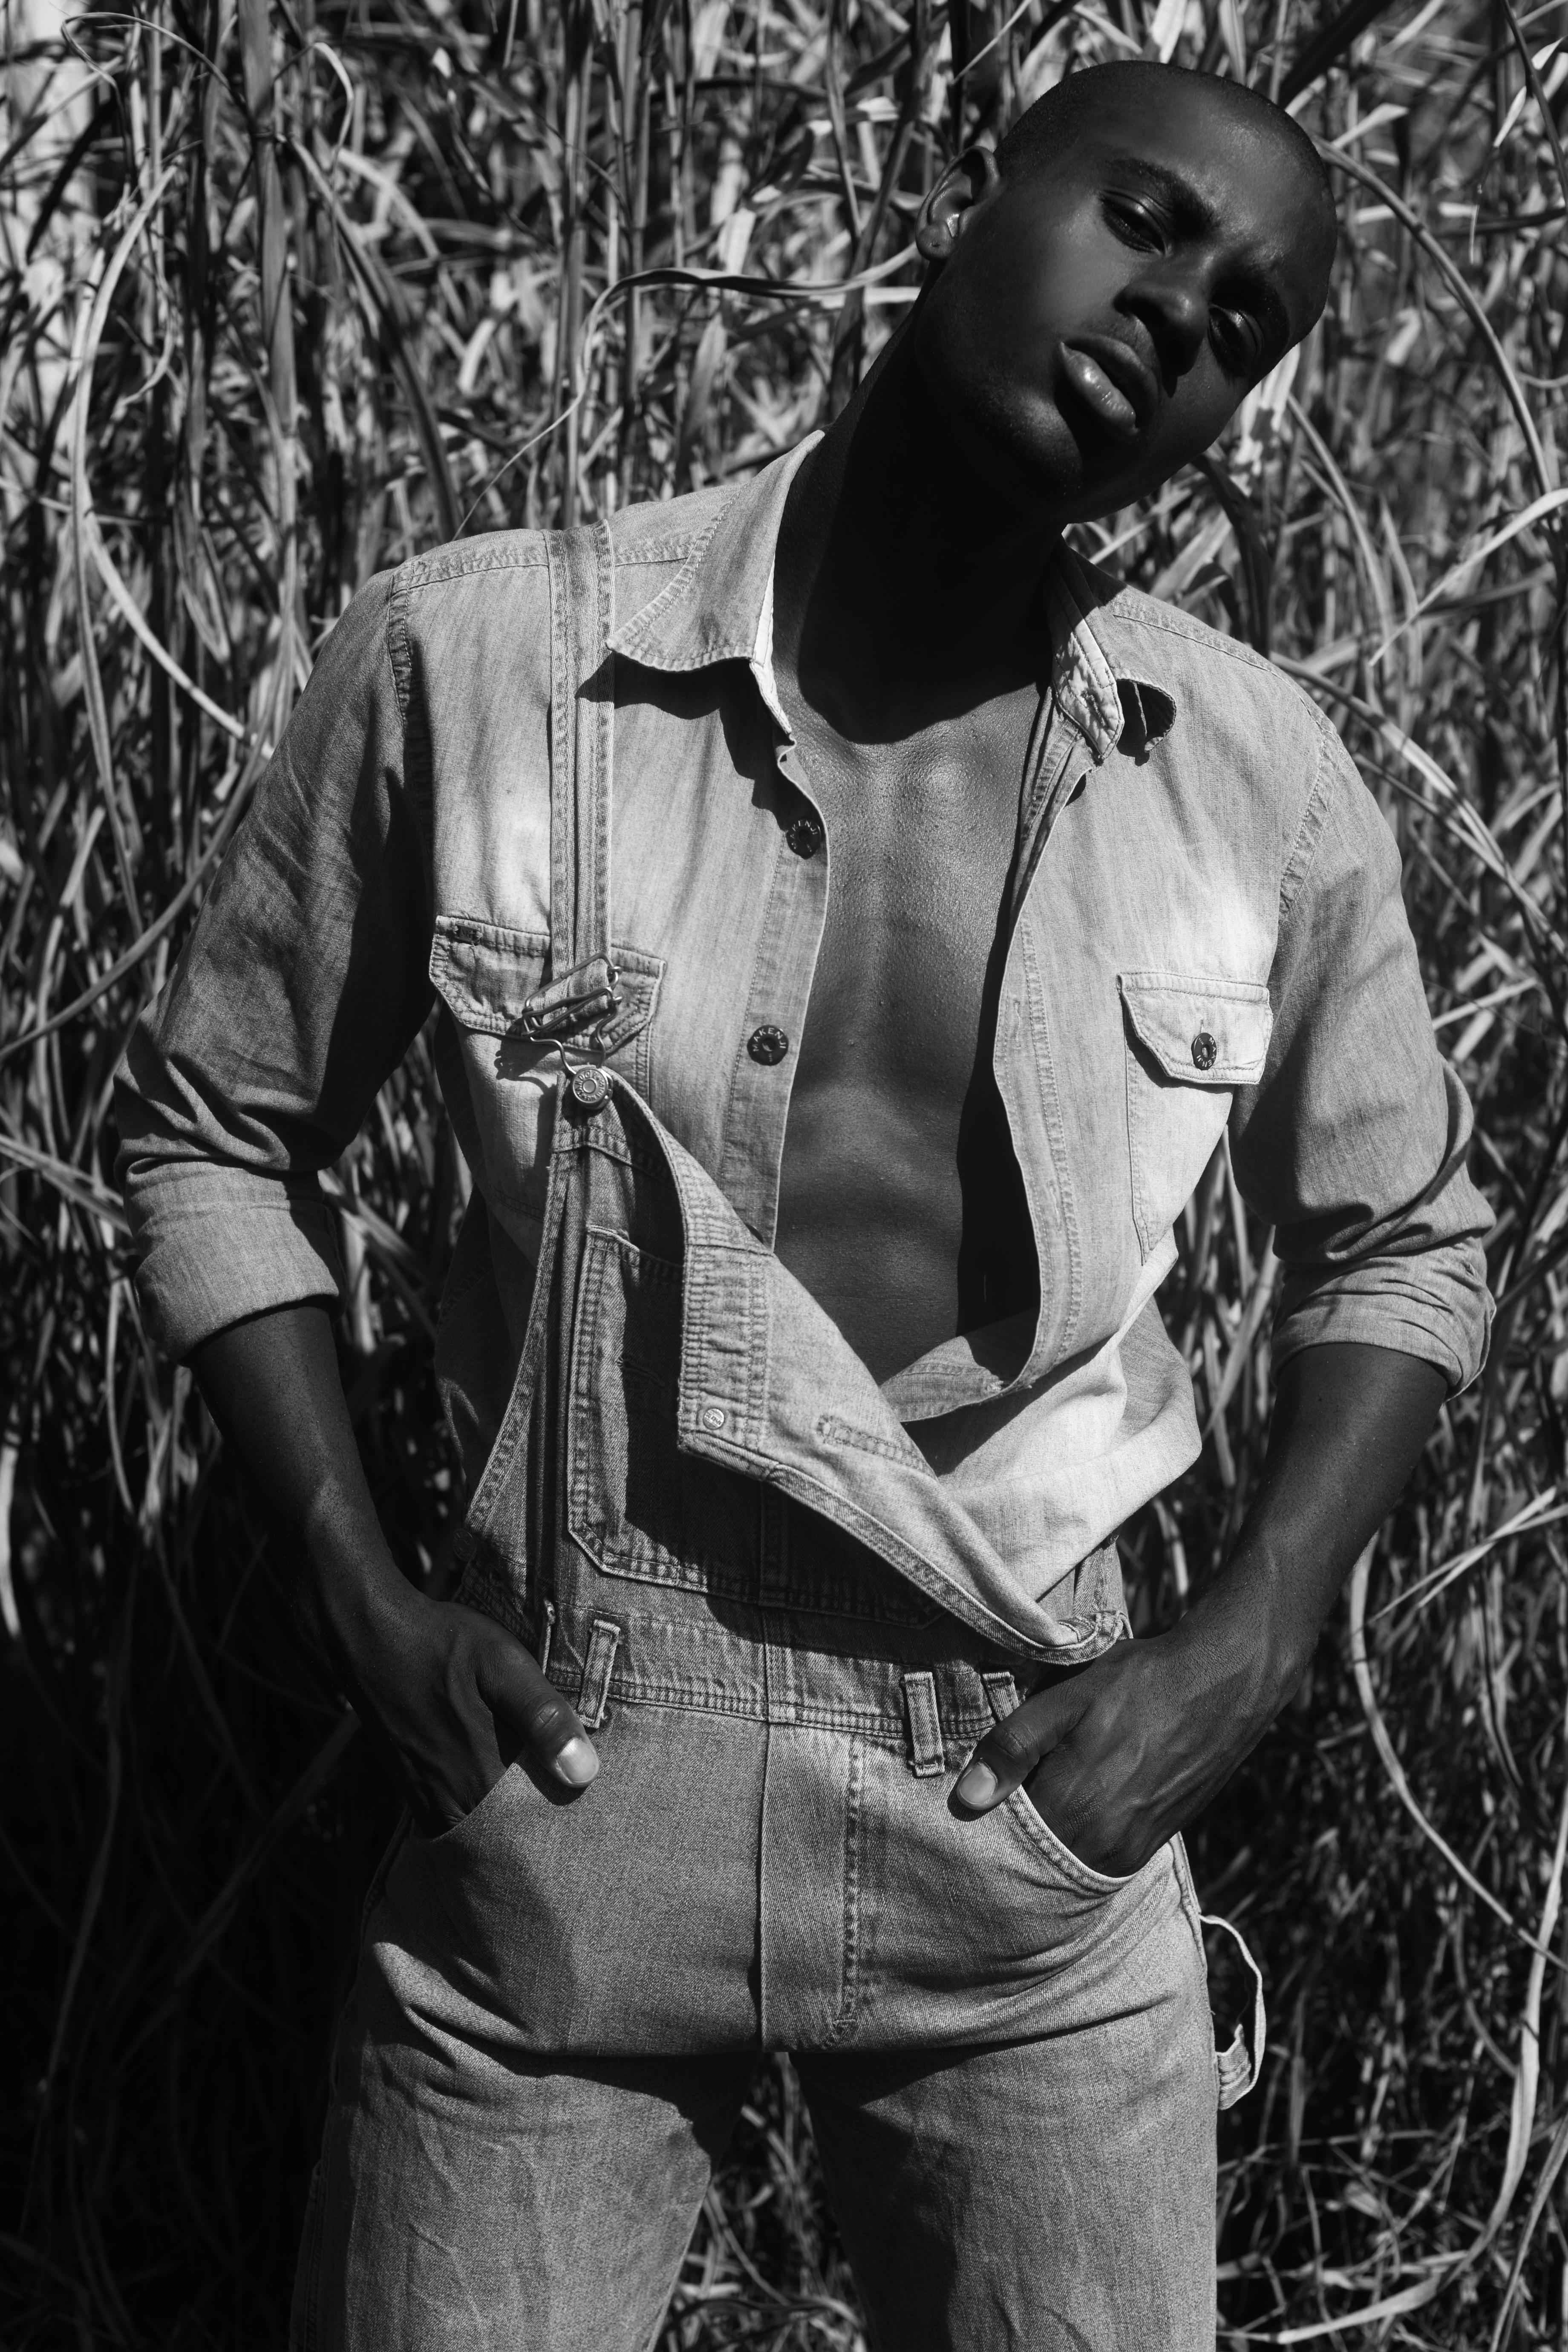 editorial masculino, rodrigo marconatto, alex cursino, moda masculina, dicas de moda, fashion style, fashion magazine, model brazil, moda sem censura, youtuber, menswear, grooming, modelo afro (6)